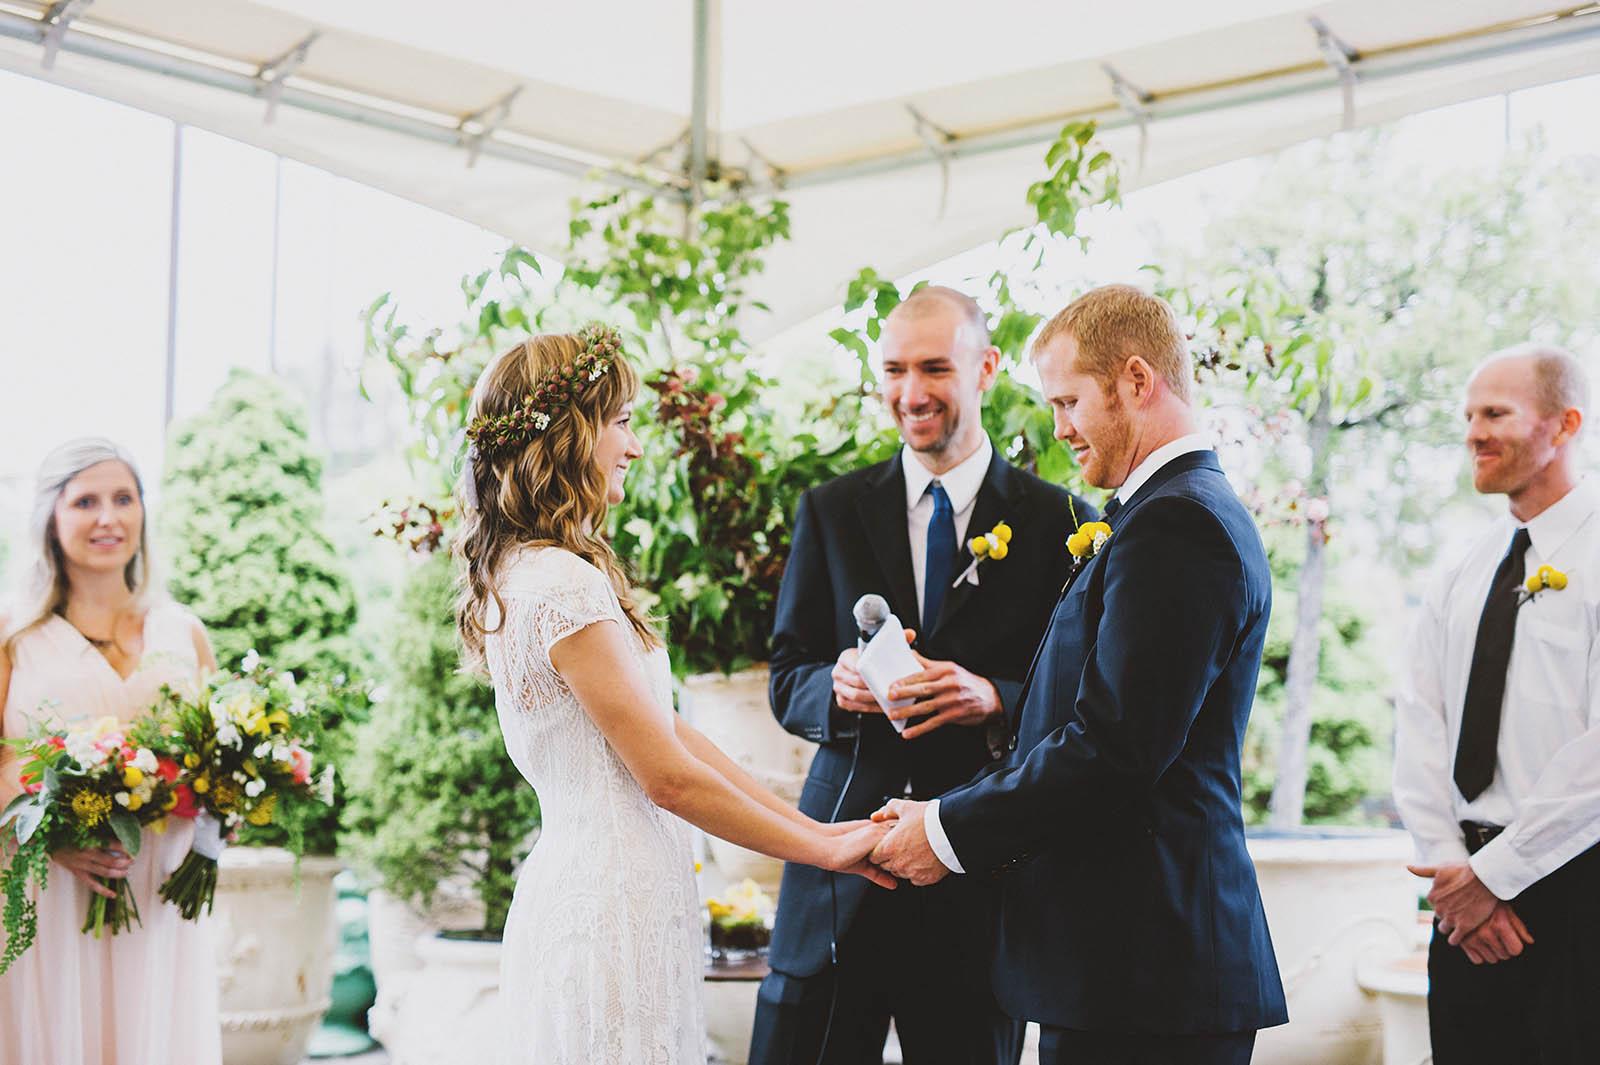 Bride and Groom at their Castaway Portland Wedding Reception